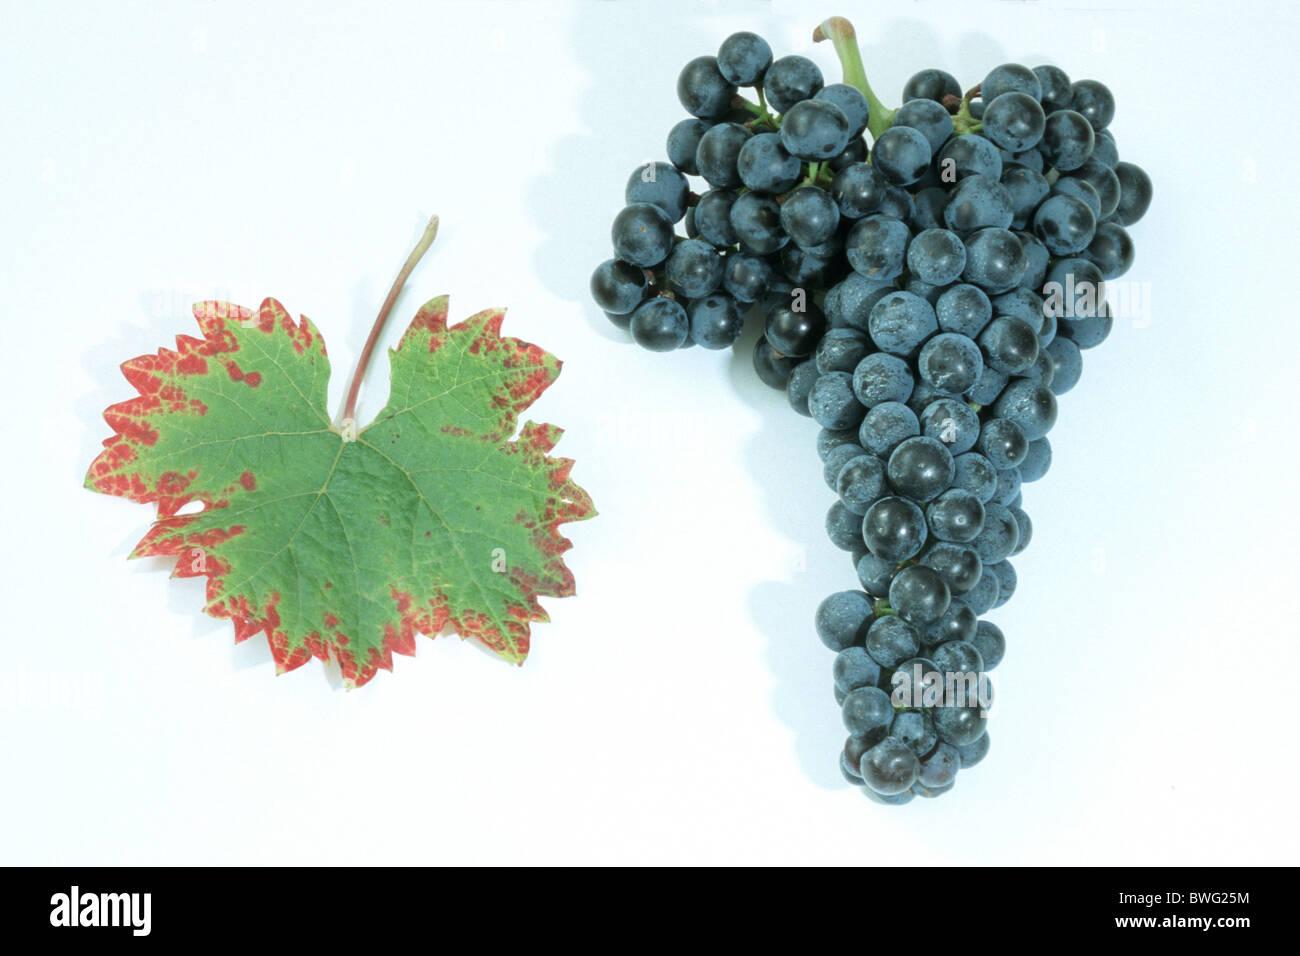 Common Grape Vine, Grape, Vine (Vitis vinifera), variety: Dornfelder, bunch of grapes and leaf, studio picture. Stock Photo